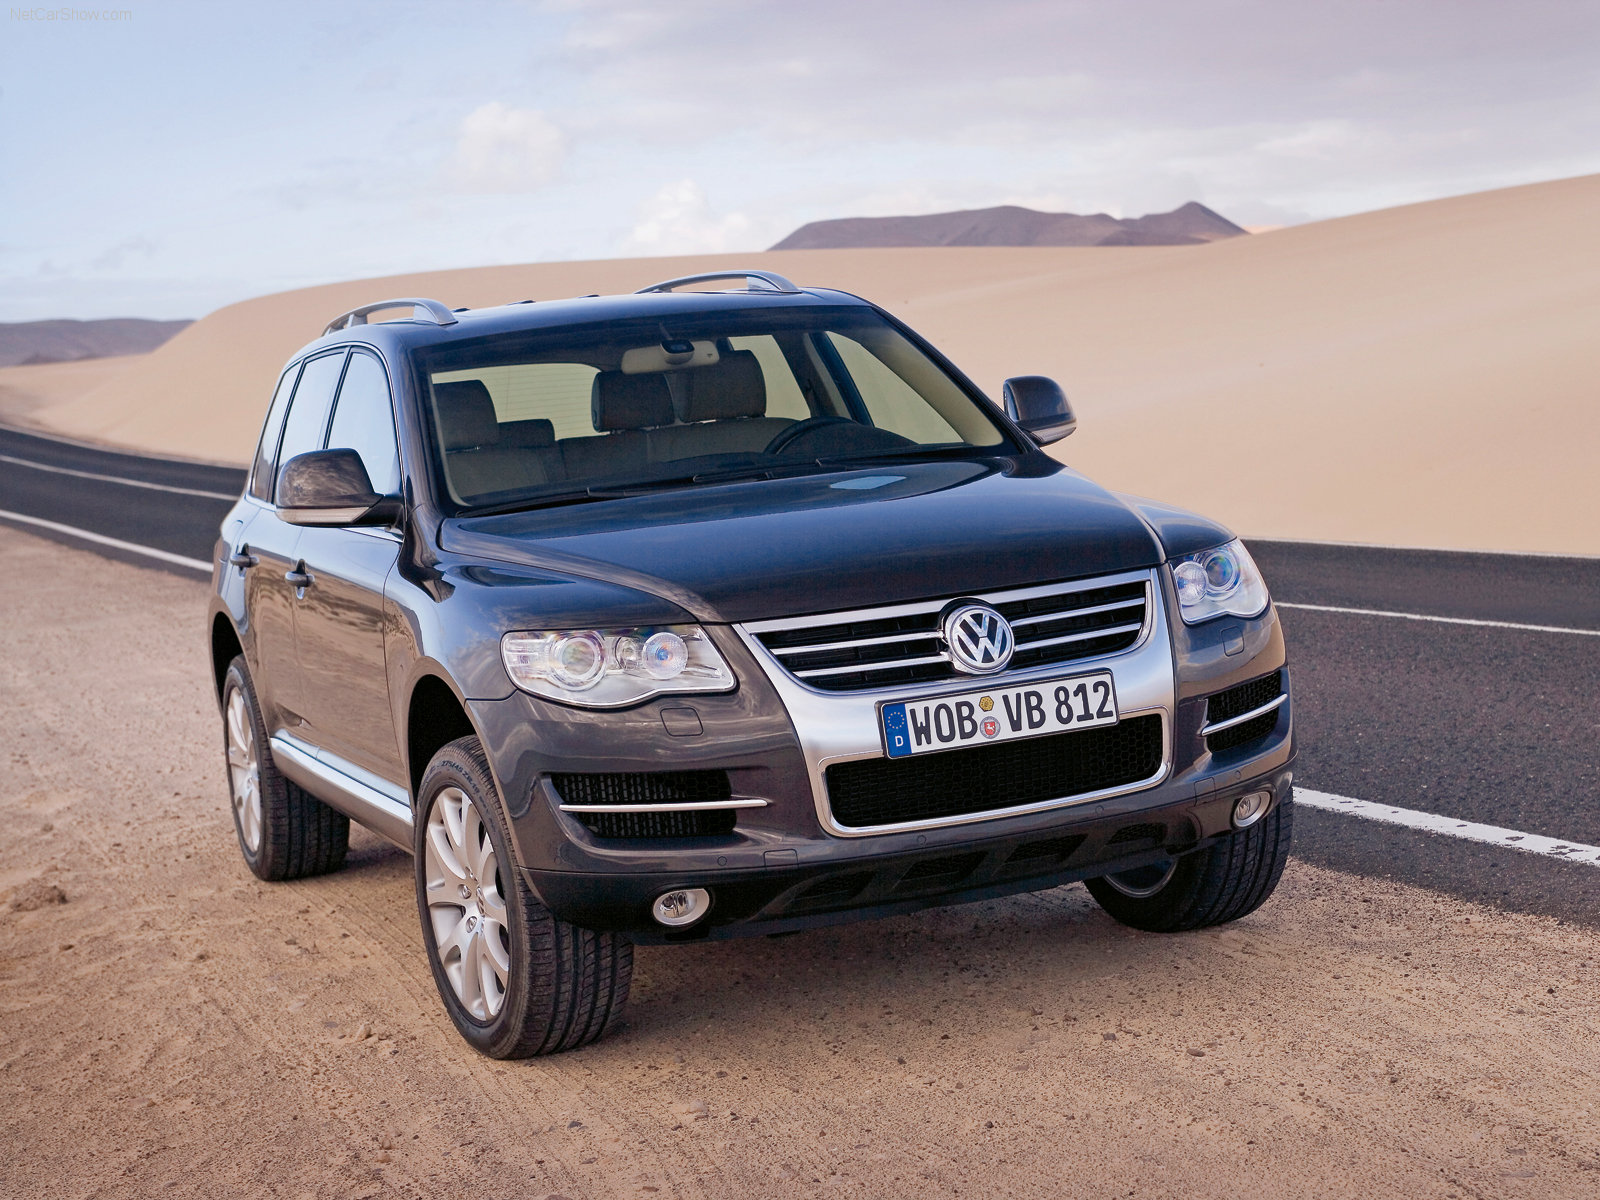 http://w04.ru/foto/Volkswagen-Touareg_2007_1600x1200_wallpaper_07.jpg